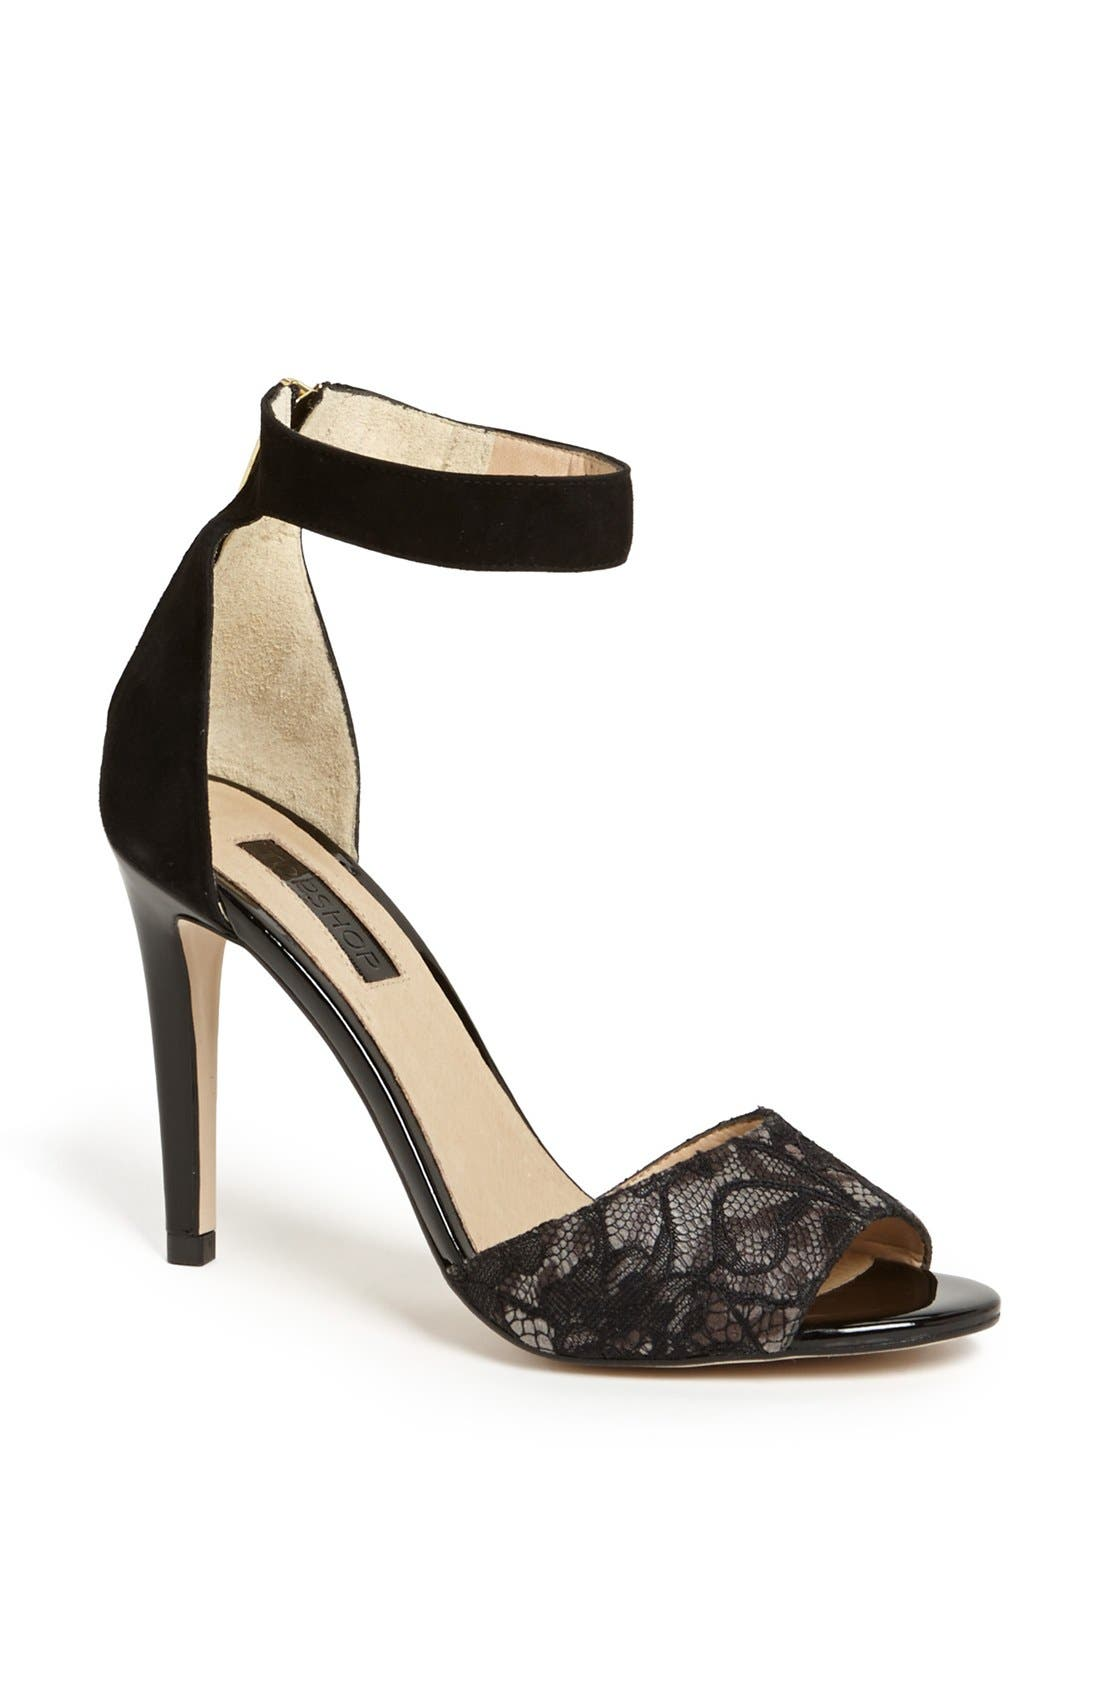 Alternate Image 1 Selected - Topshop 'Rees' Sandal